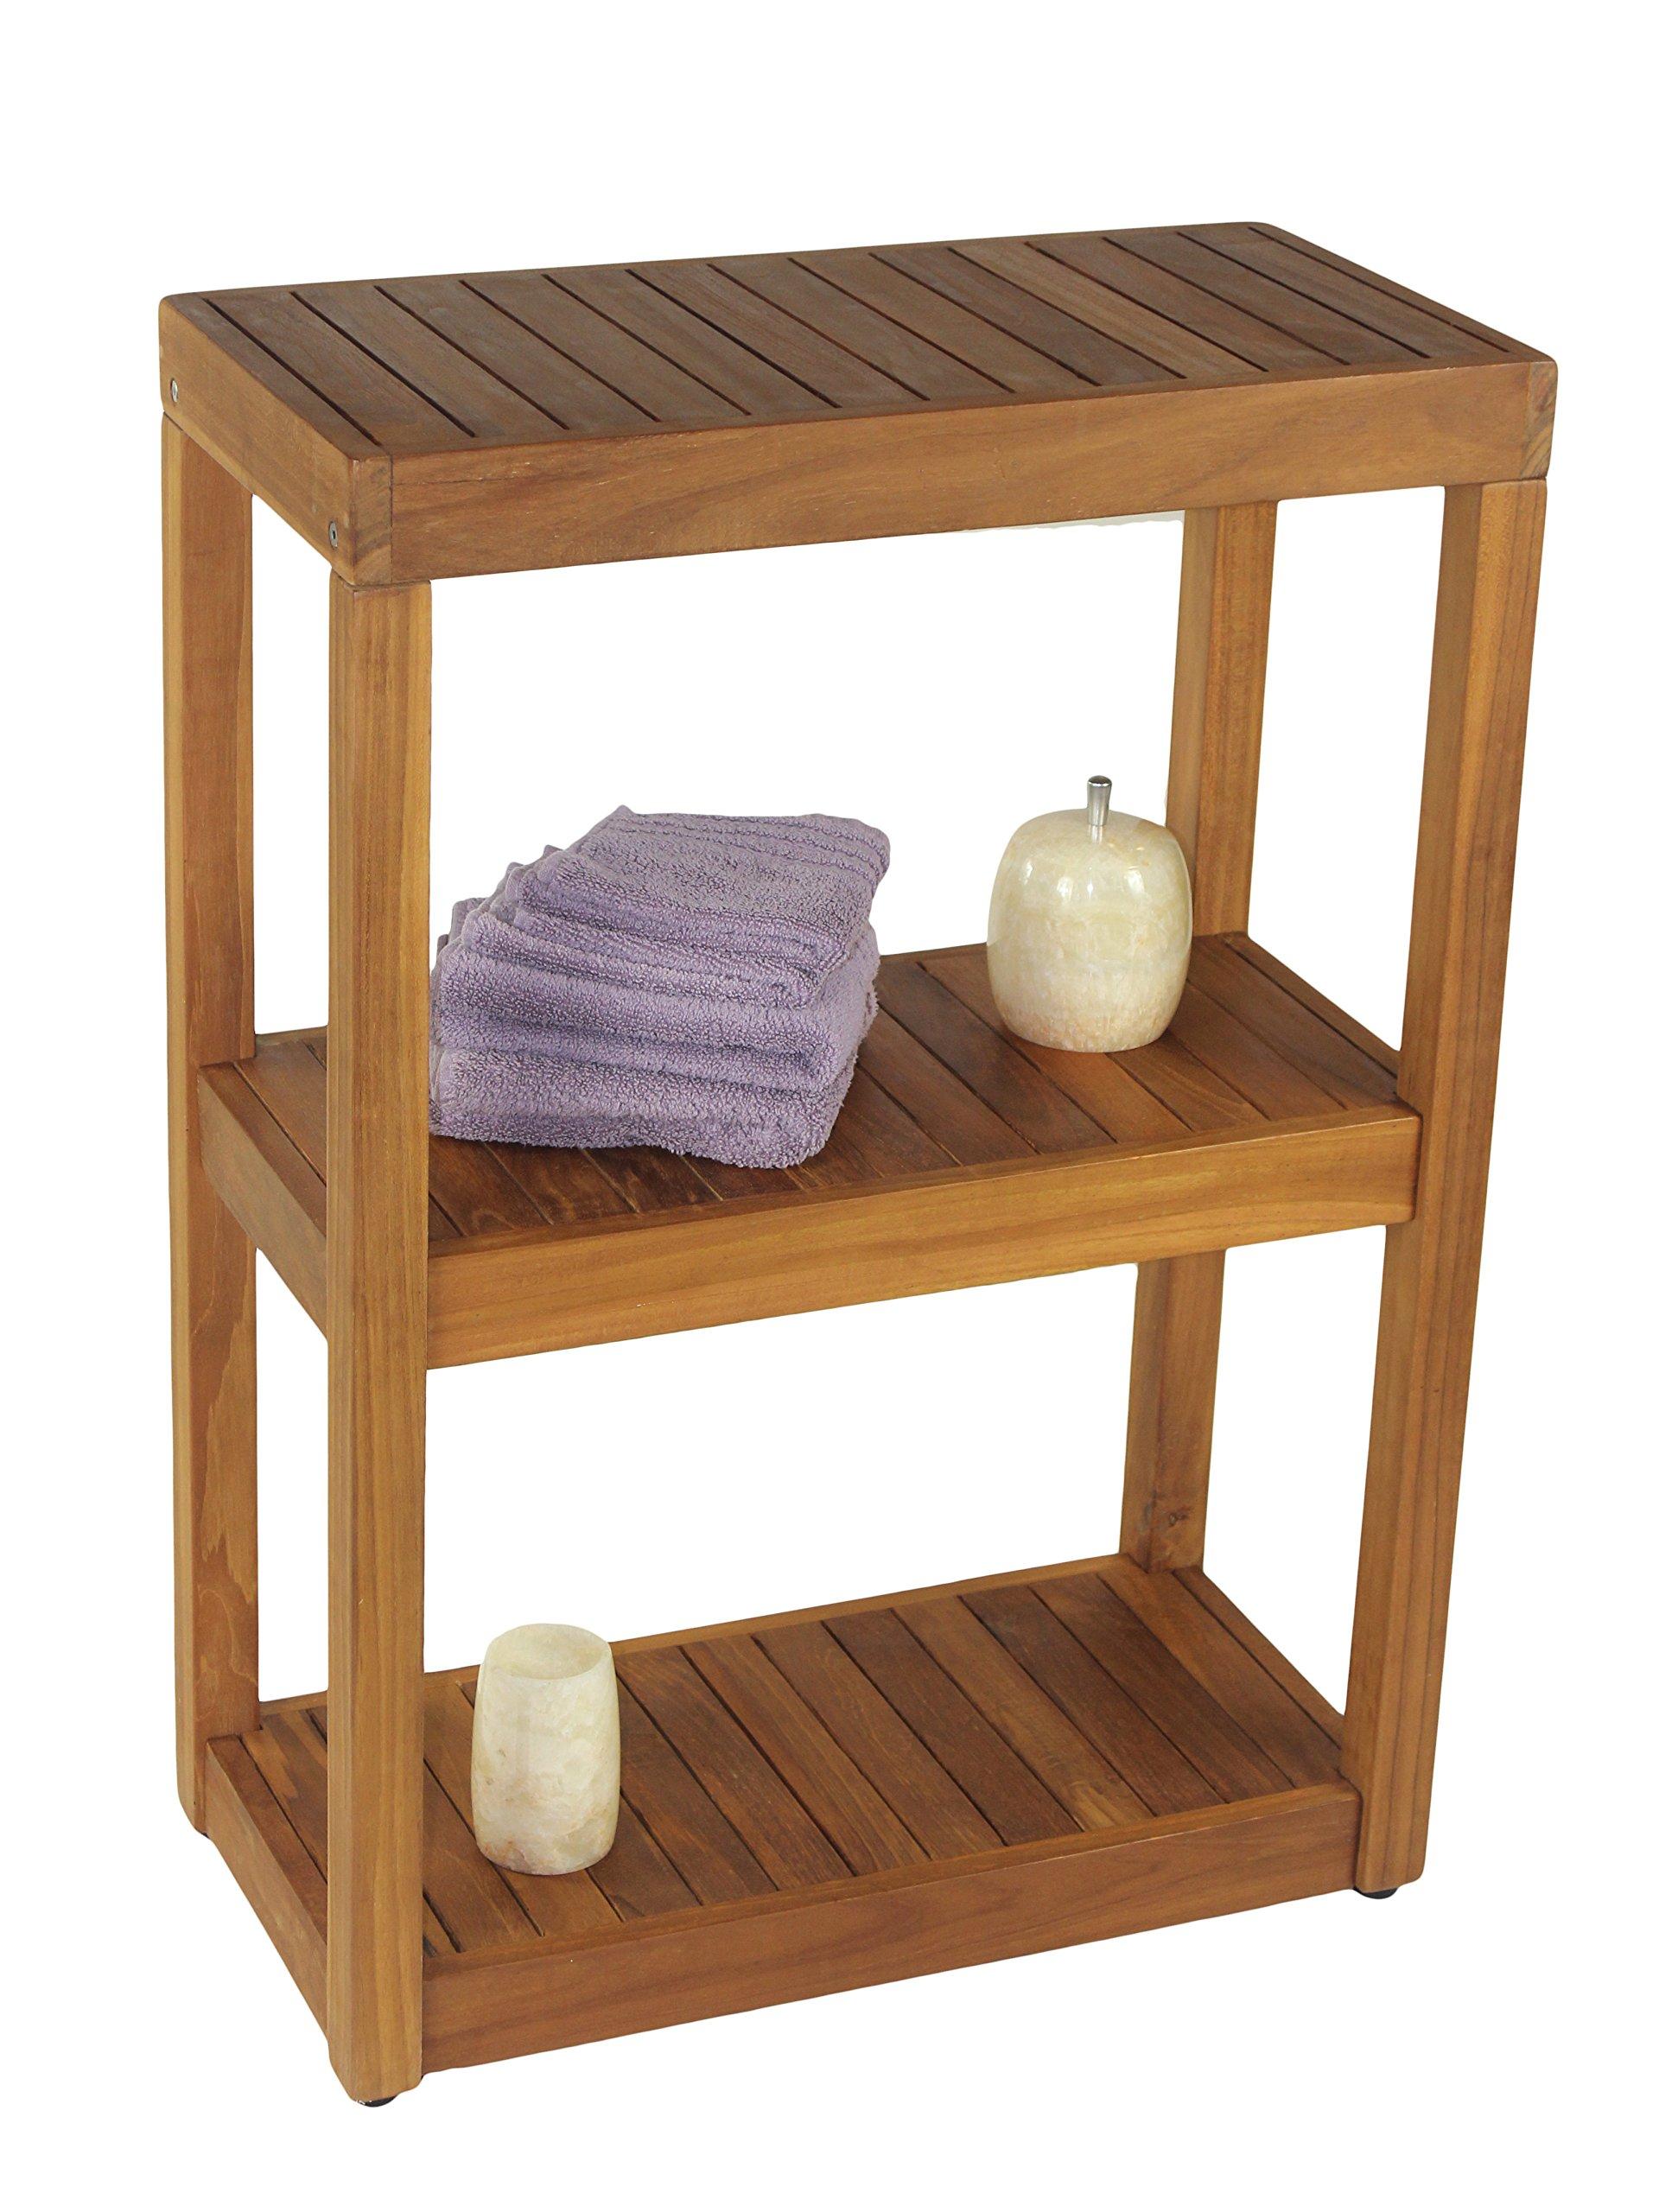 The Original Sula Rectangle Three Tier Teak Bath Stand